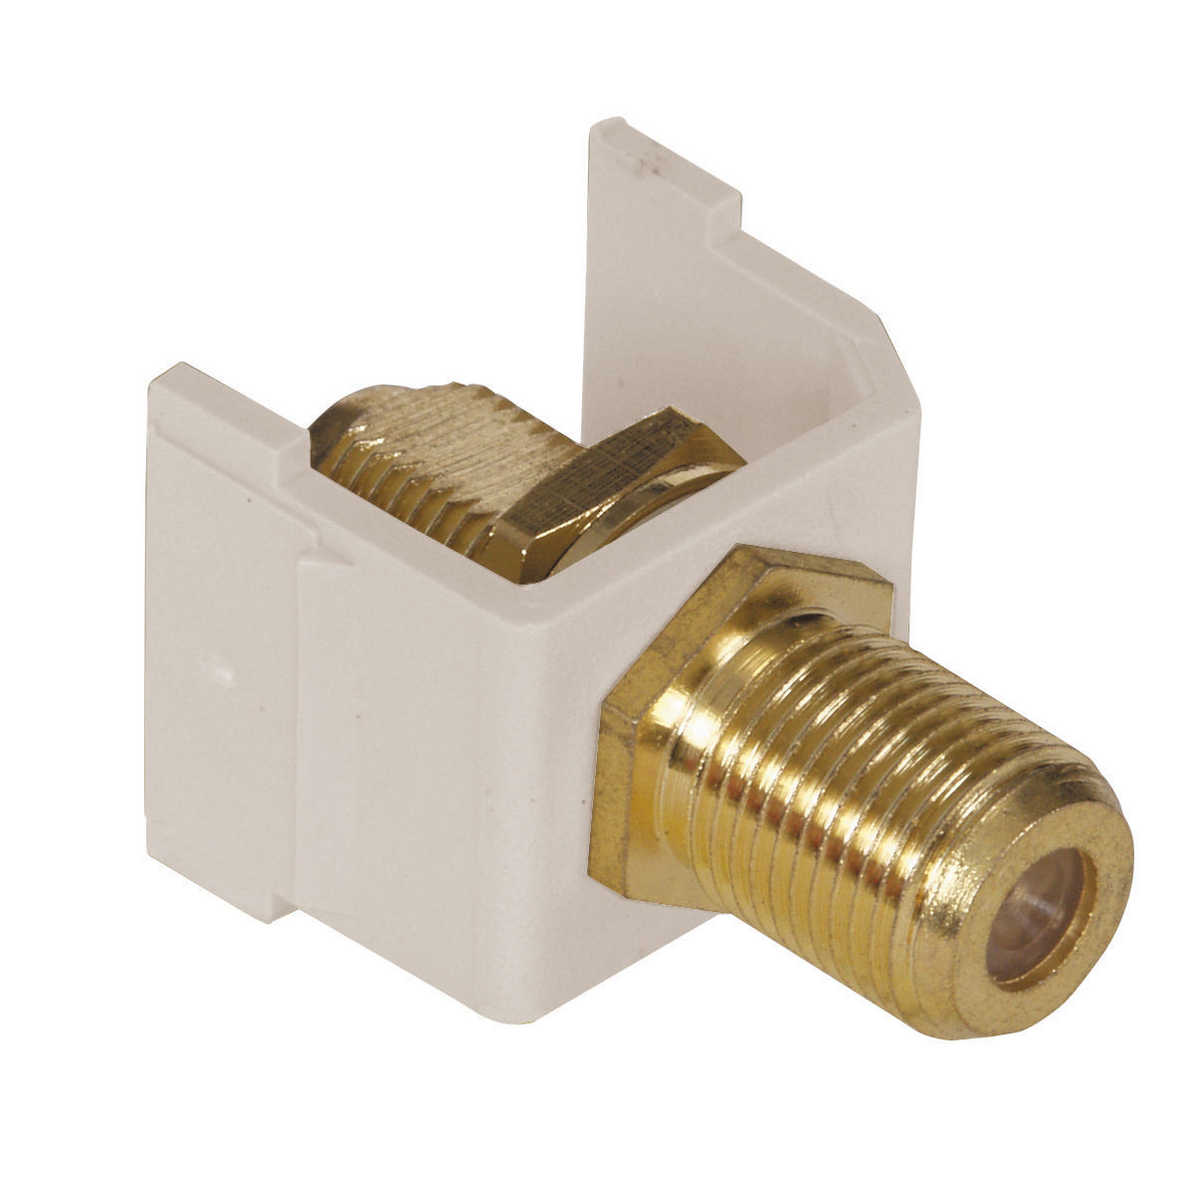 HUBPR SFF3GLA SNAP-FIT, 3GHZ, GOLD F CONN, LA 3Ghz f-connector insert light almond